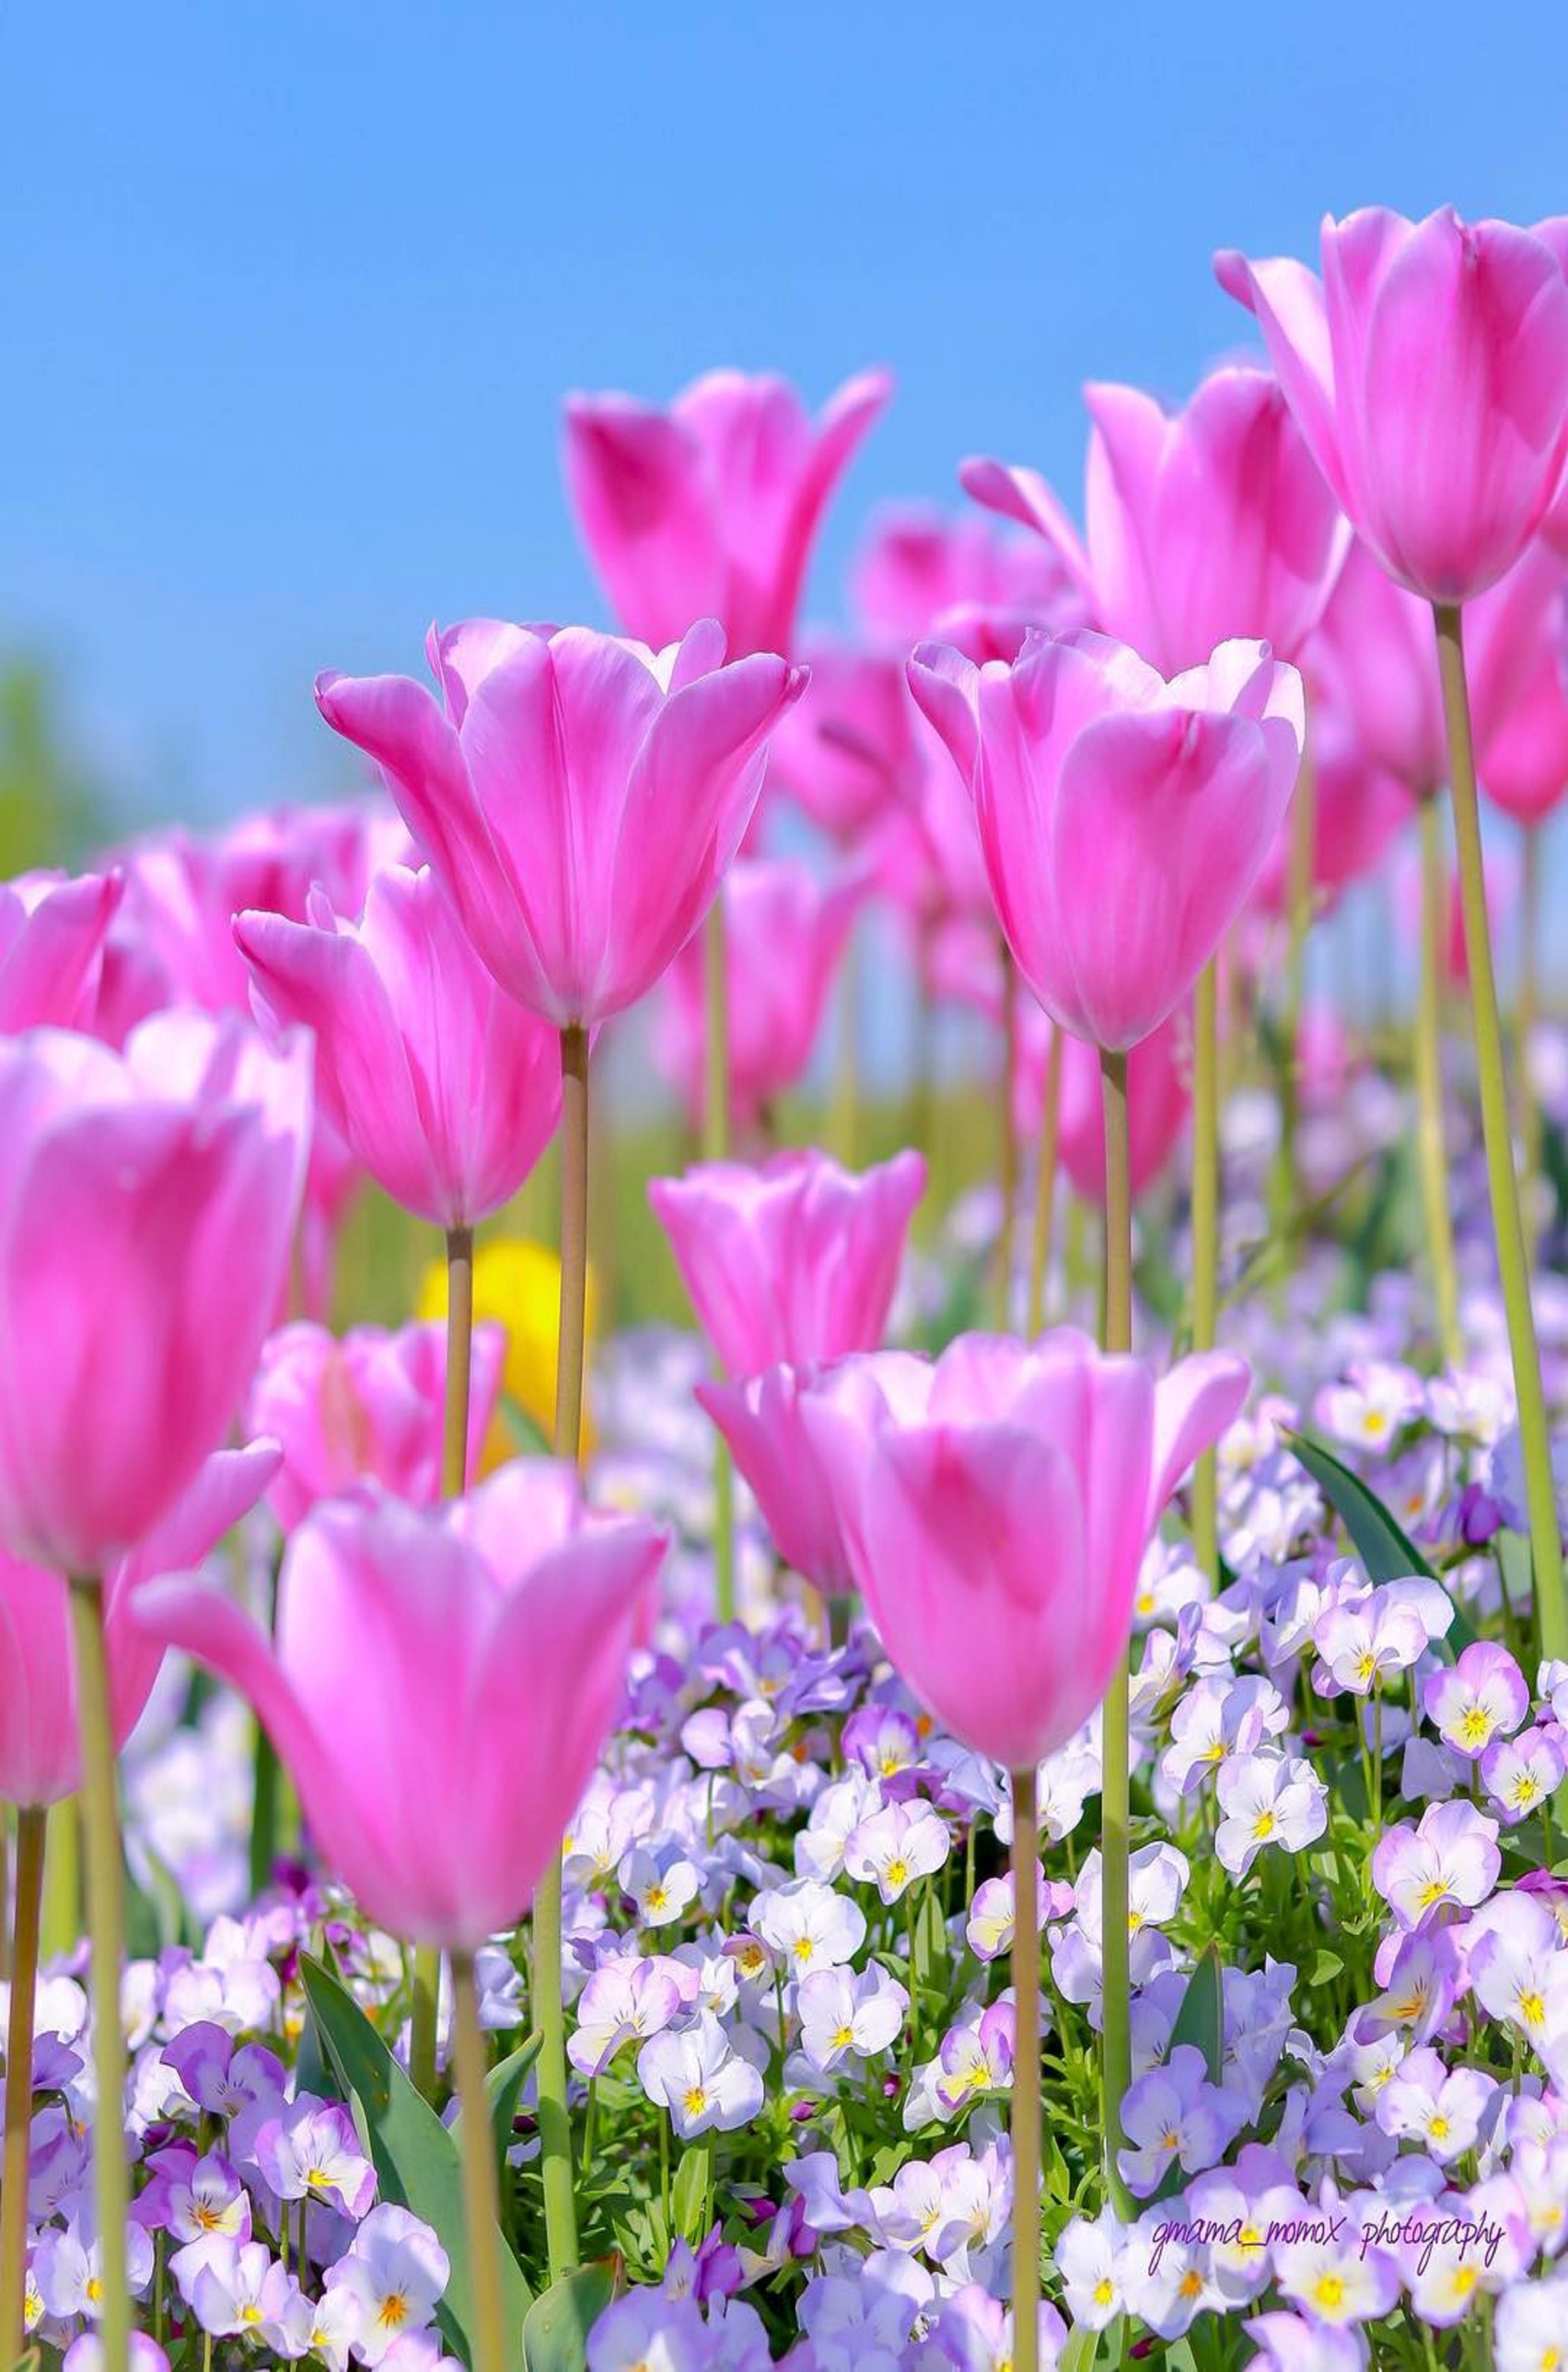 Pin by ivanka kostova on растения Flowers photography